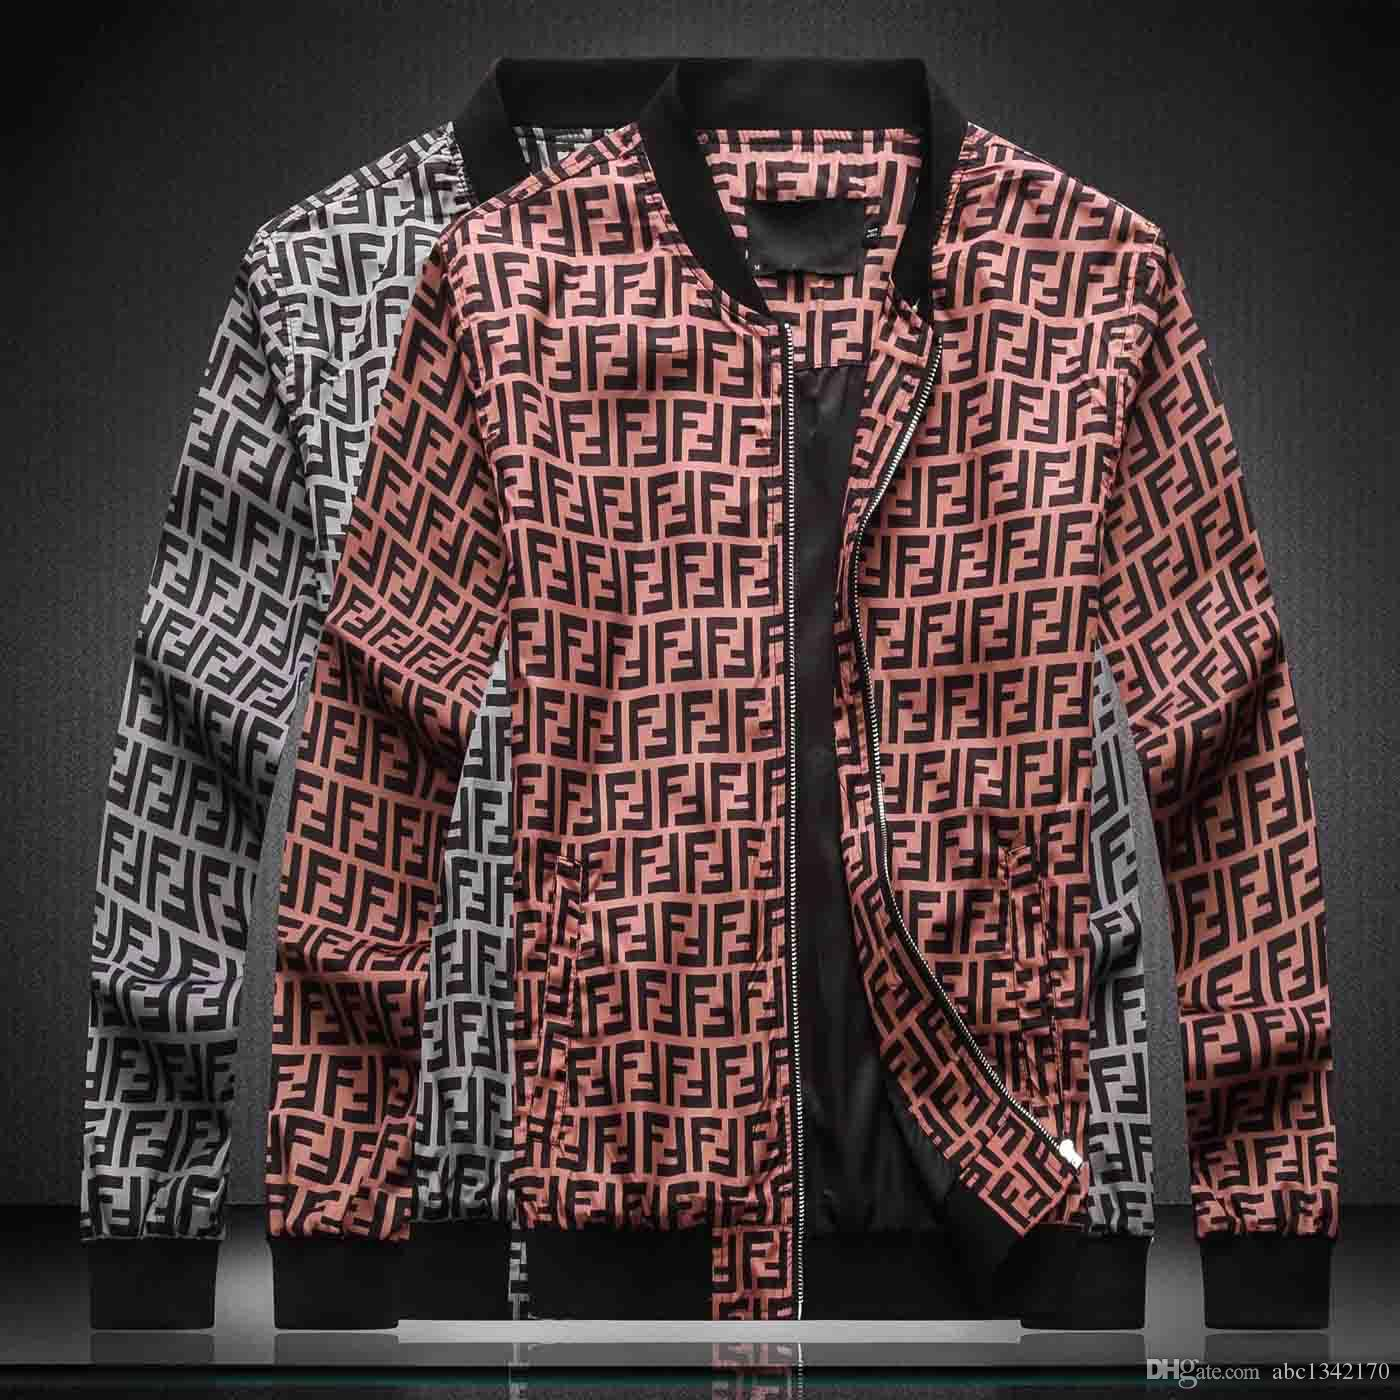 19SS-2020 Herbst-Winter-Brand New Luxury Design langärmelige Meduse Herren-Jacken Windjacke Men Casual Jacken Größe M-4XL